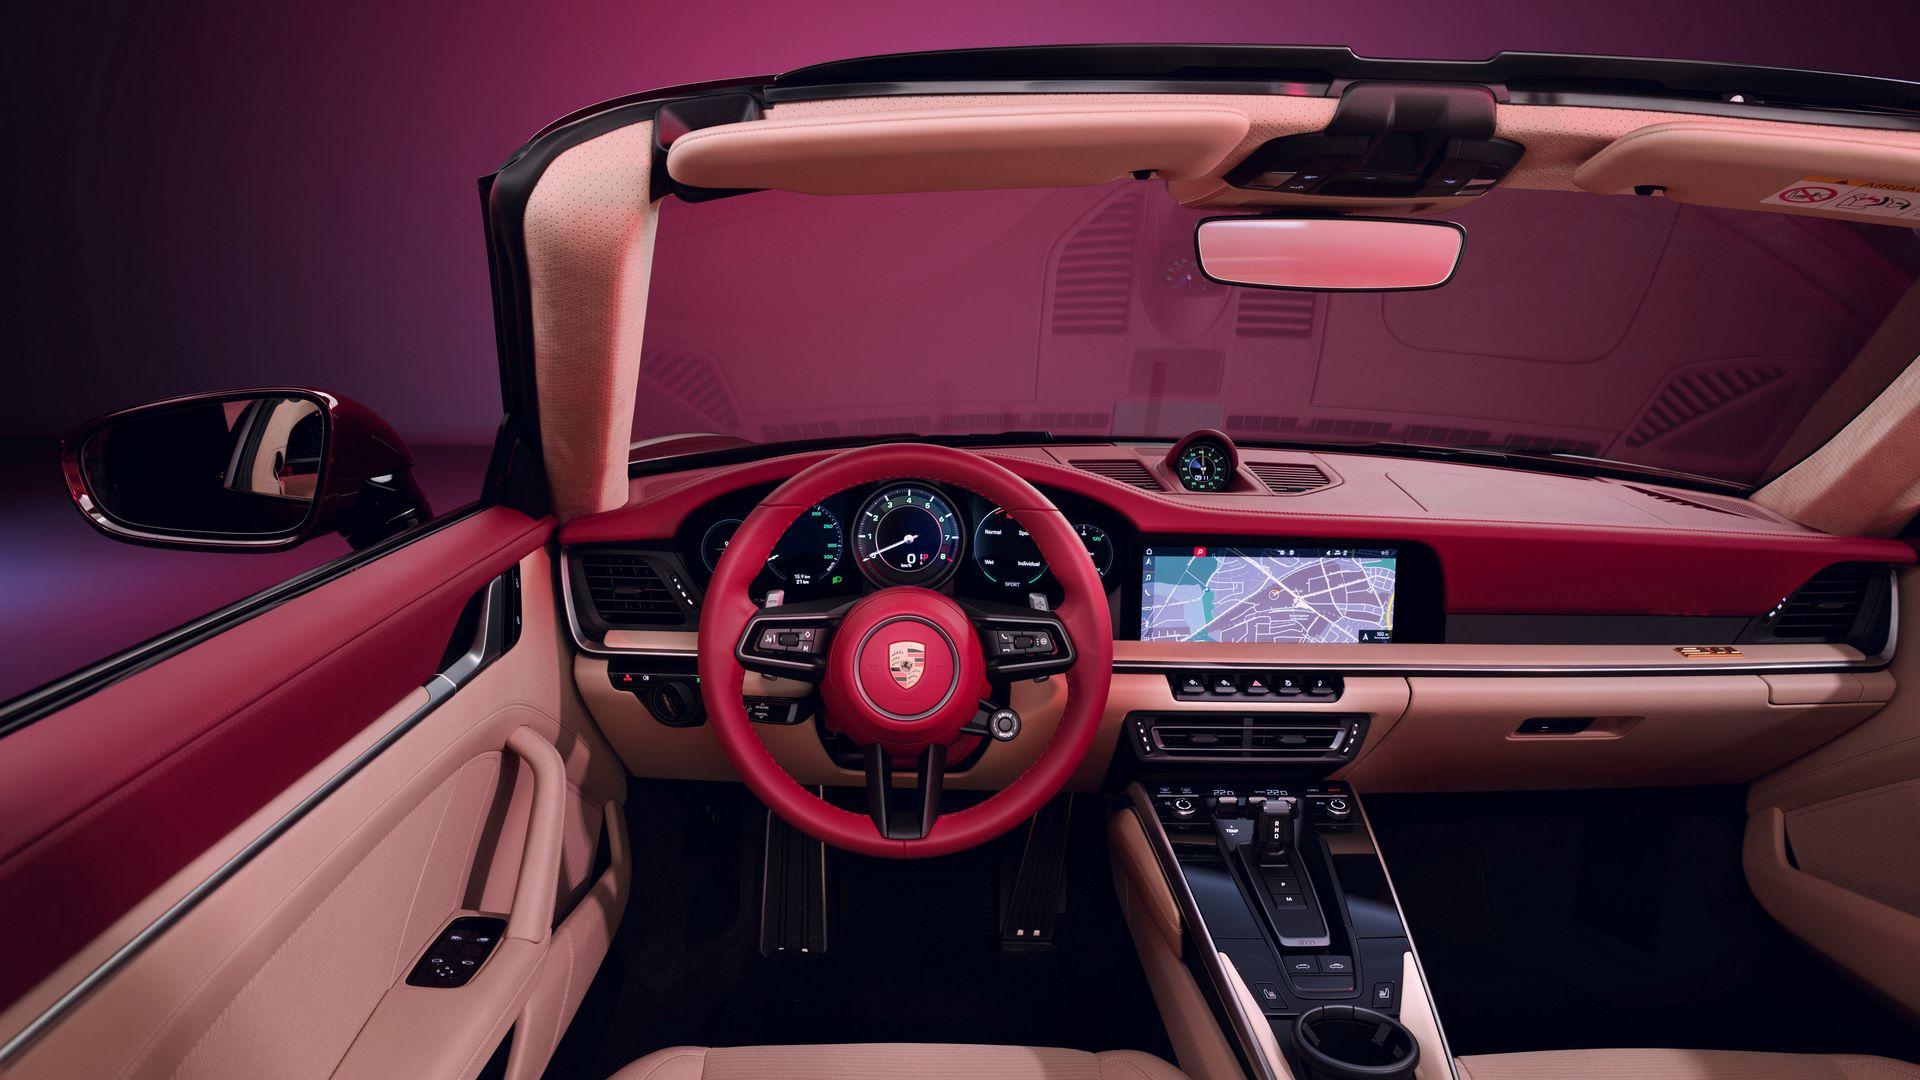 Porsche-911-Targa-4S-Heritage-Design-Edition-6